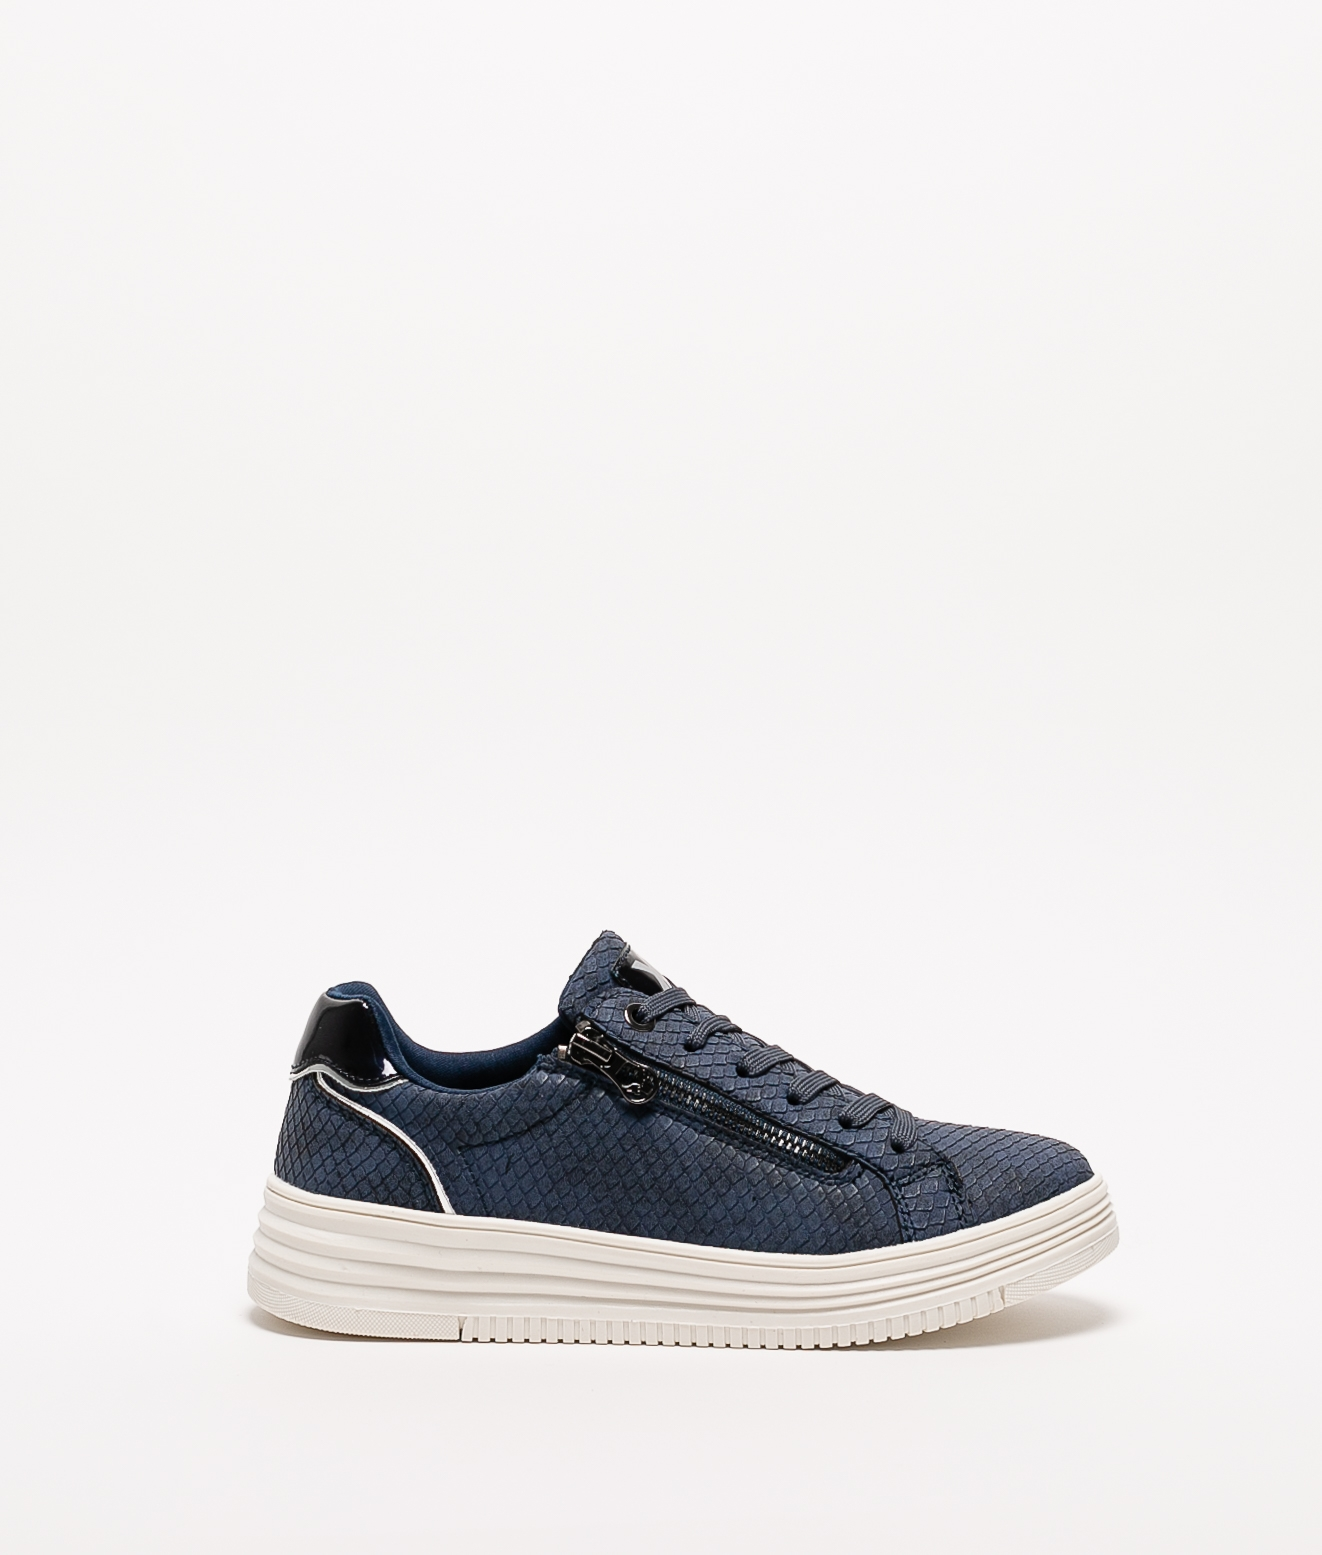 Sneakers Soule Xti - Blu